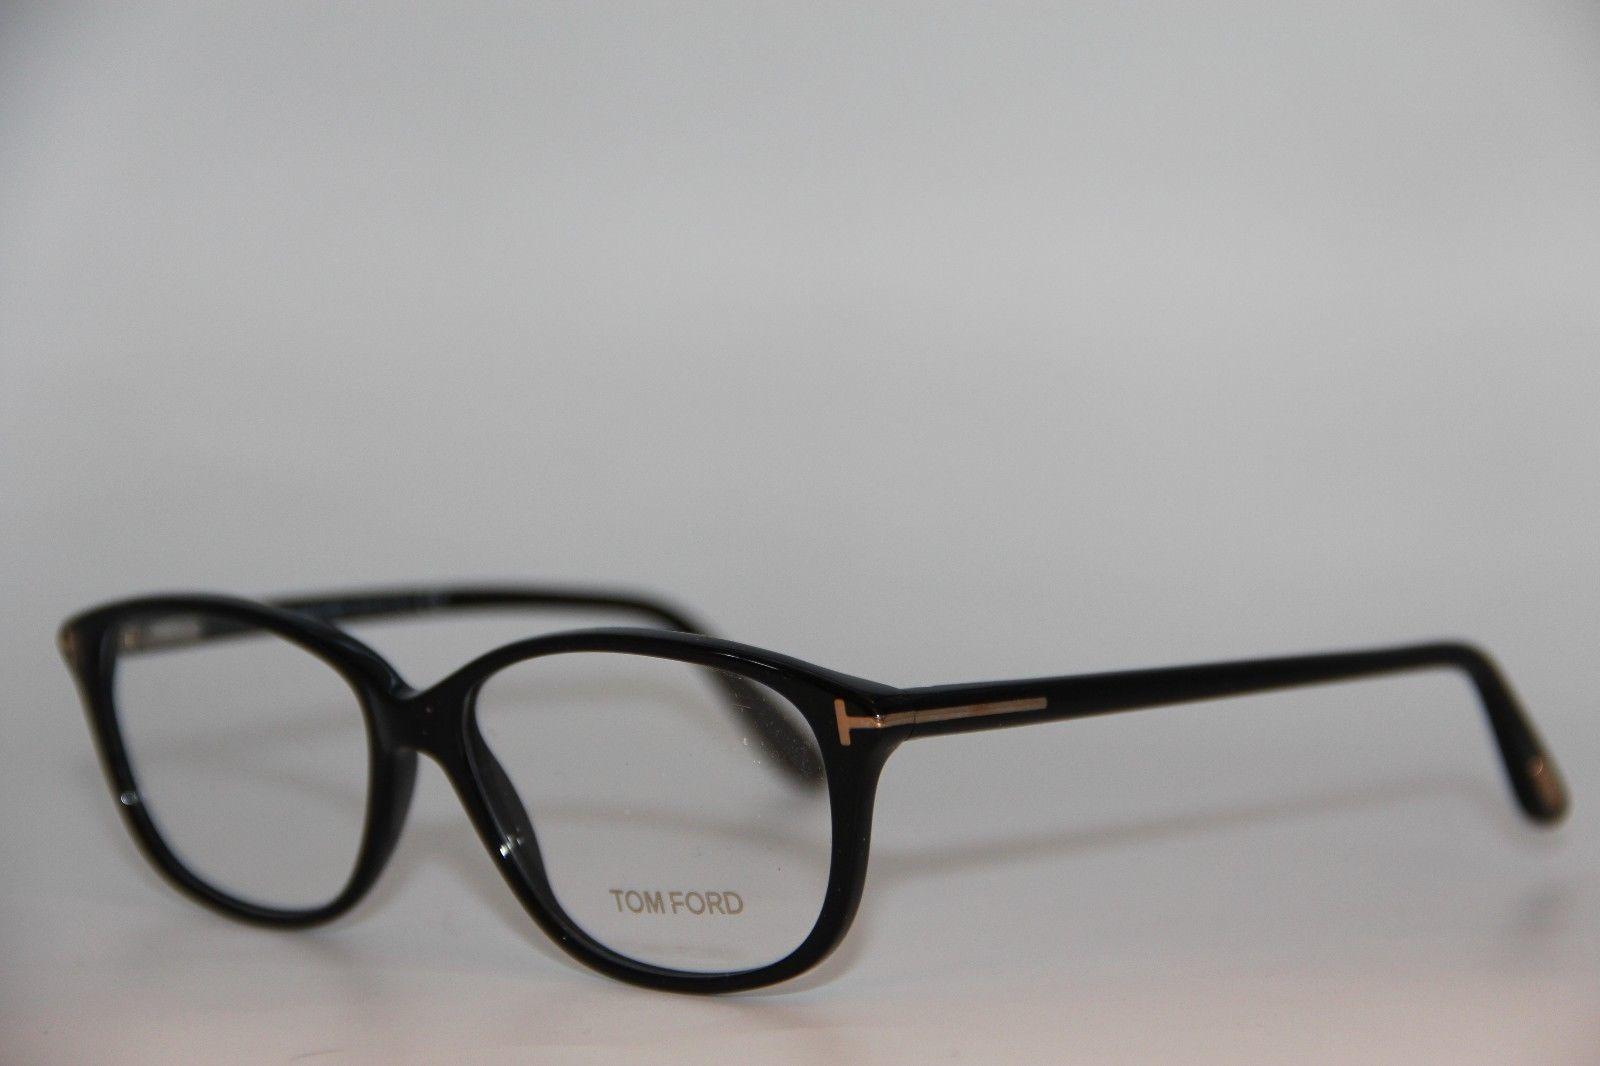 d6be9e5b8f02 New Tom Ford Tf 5316 001 Black Eyeglasses and 50 similar items. 57